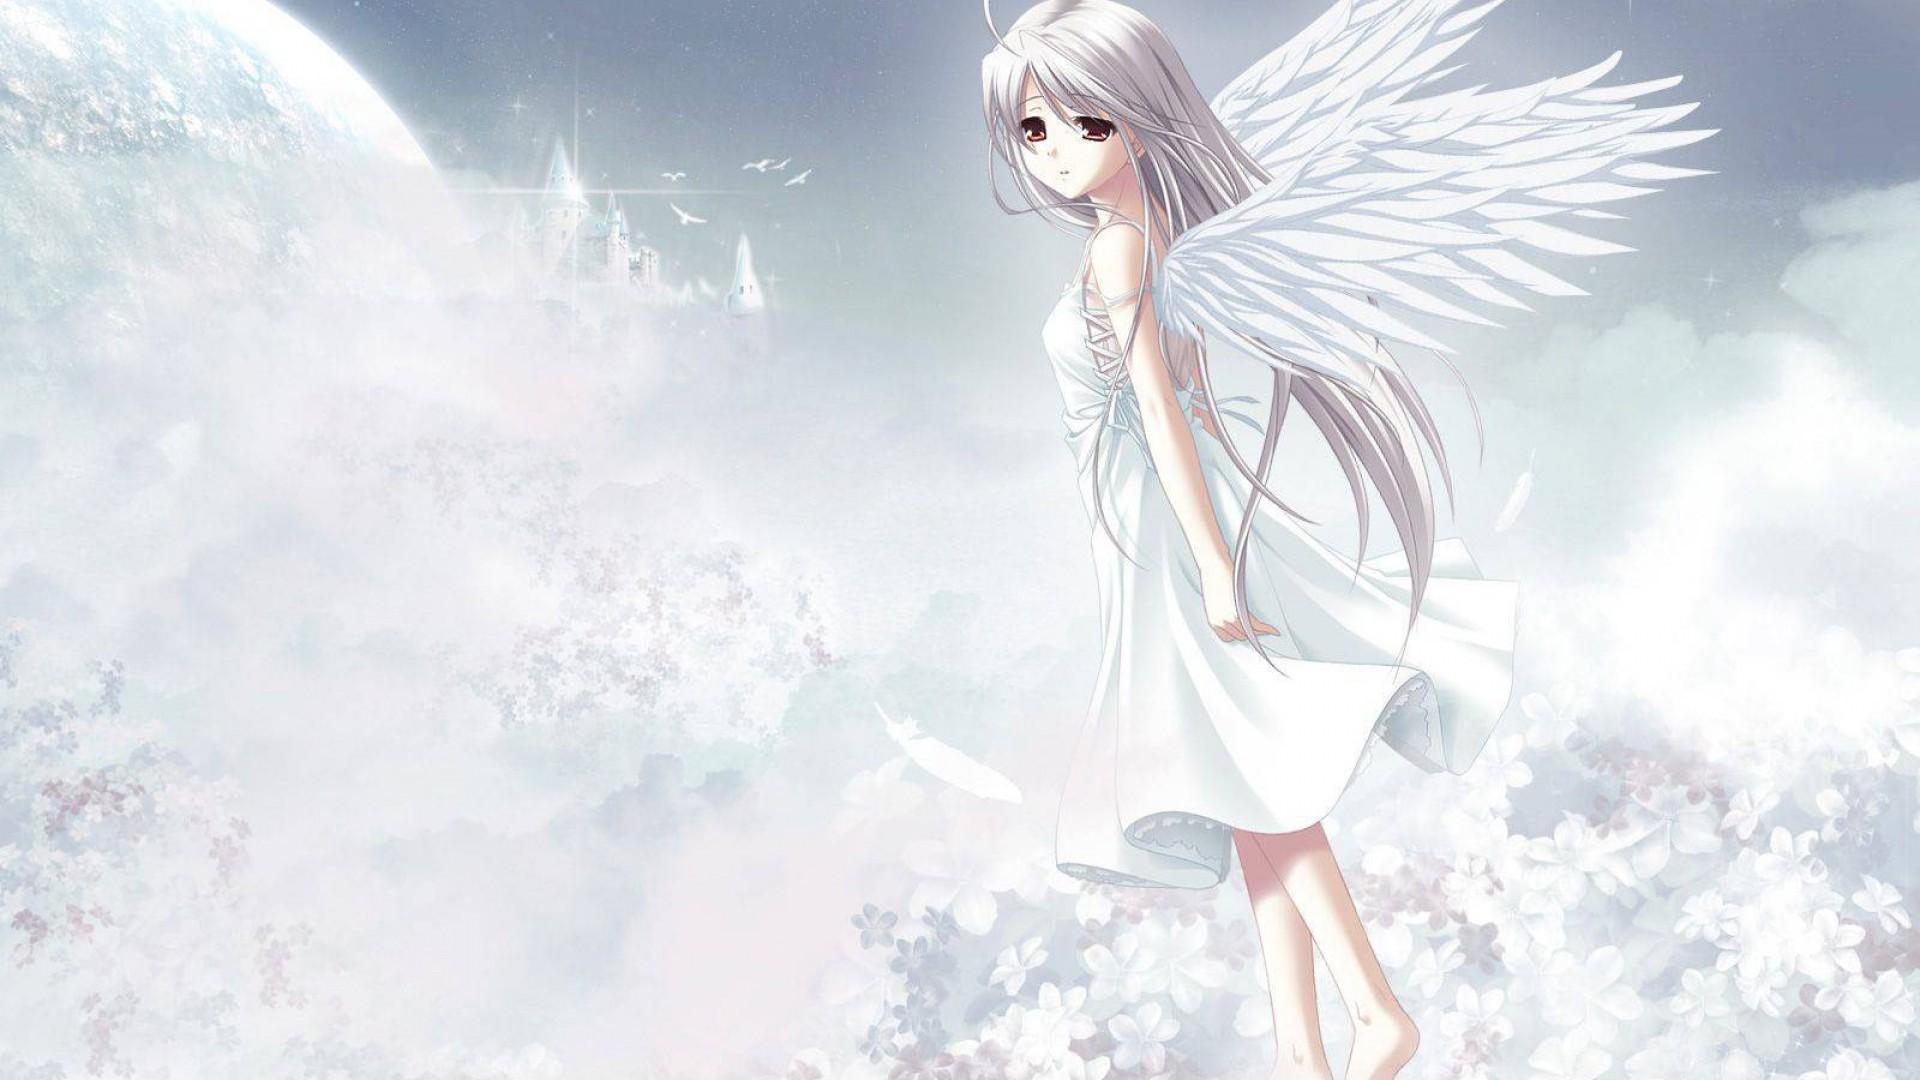 Cute Anime Angel Girl HD Wallpaper   Stylish HD Wallpapers 1920x1080